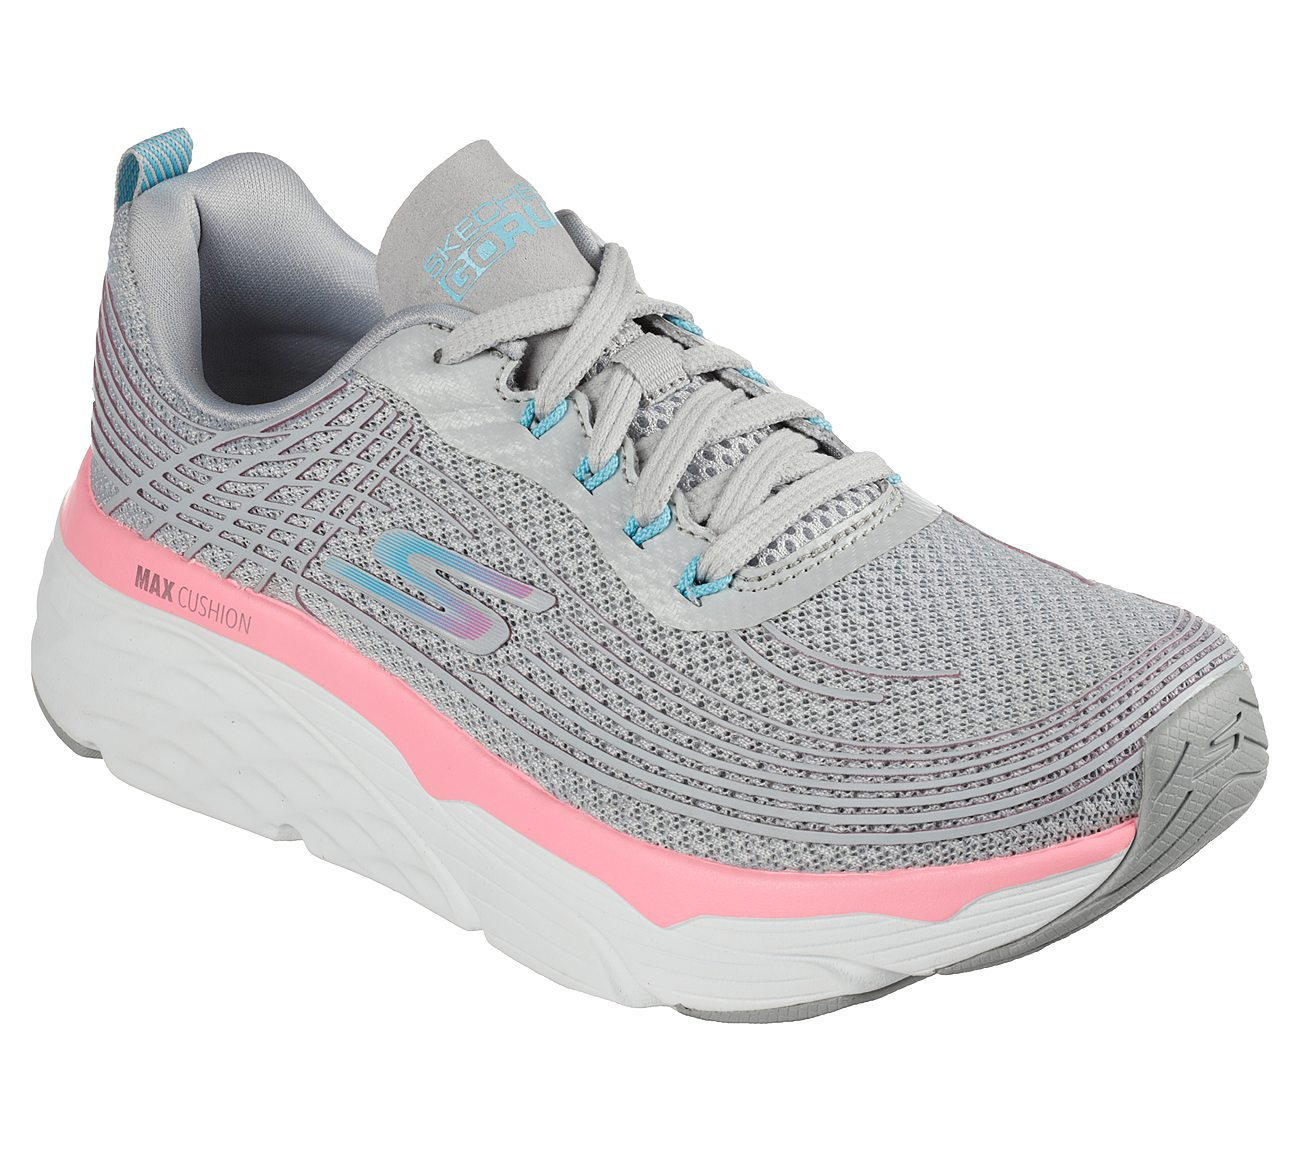 gemelo tornillo espectro  Buy SKECHERS Skechers Max Cushioning Elite Skechers Max Cushioning Shoes